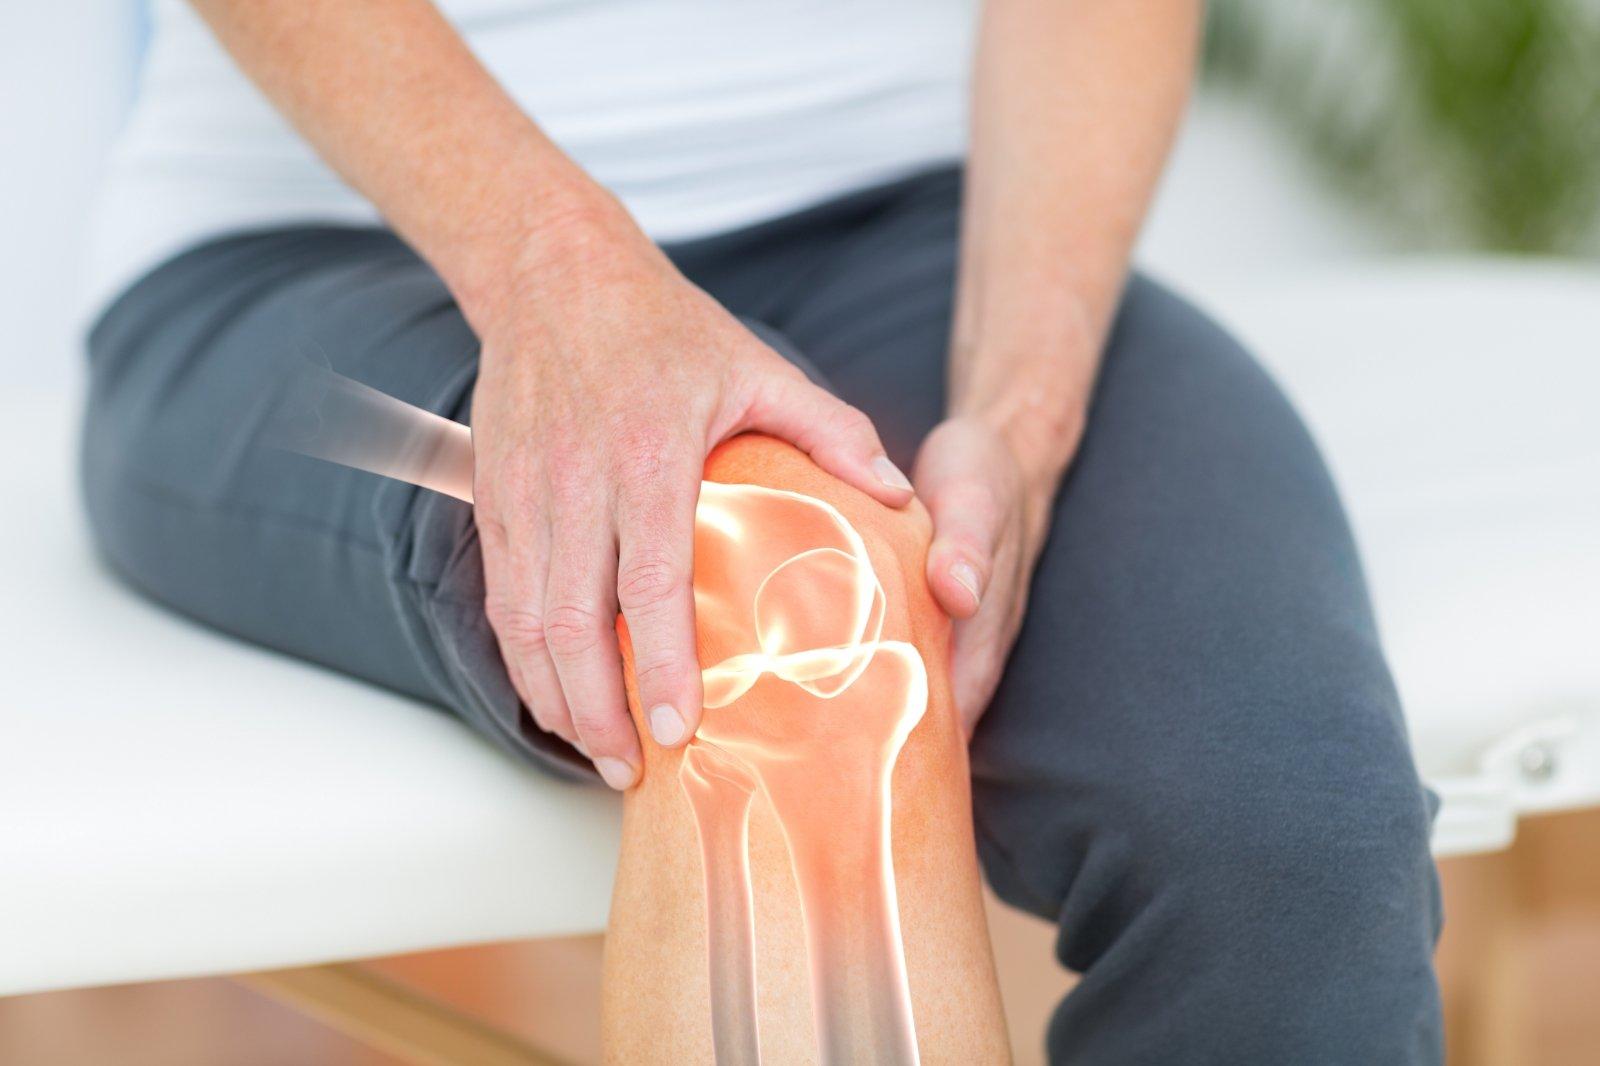 artrito artrito liaudies gynimo auch